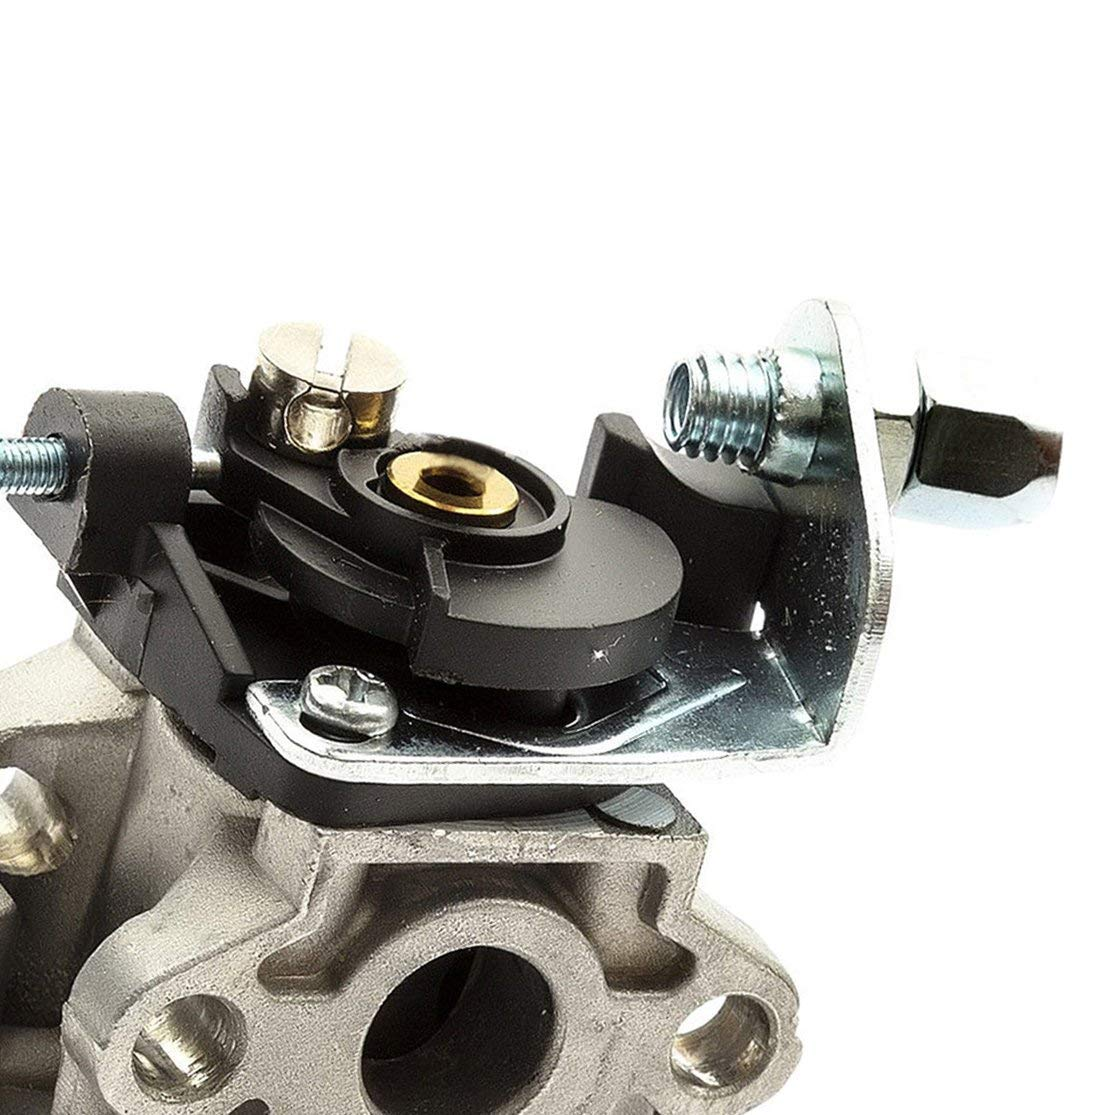 LouiseEvel215 11mm Carb Carburatore Primer Bulb per 43 47cc 49cc 50cc 2-Tempi Choppers ATV Pocket Bike Moto